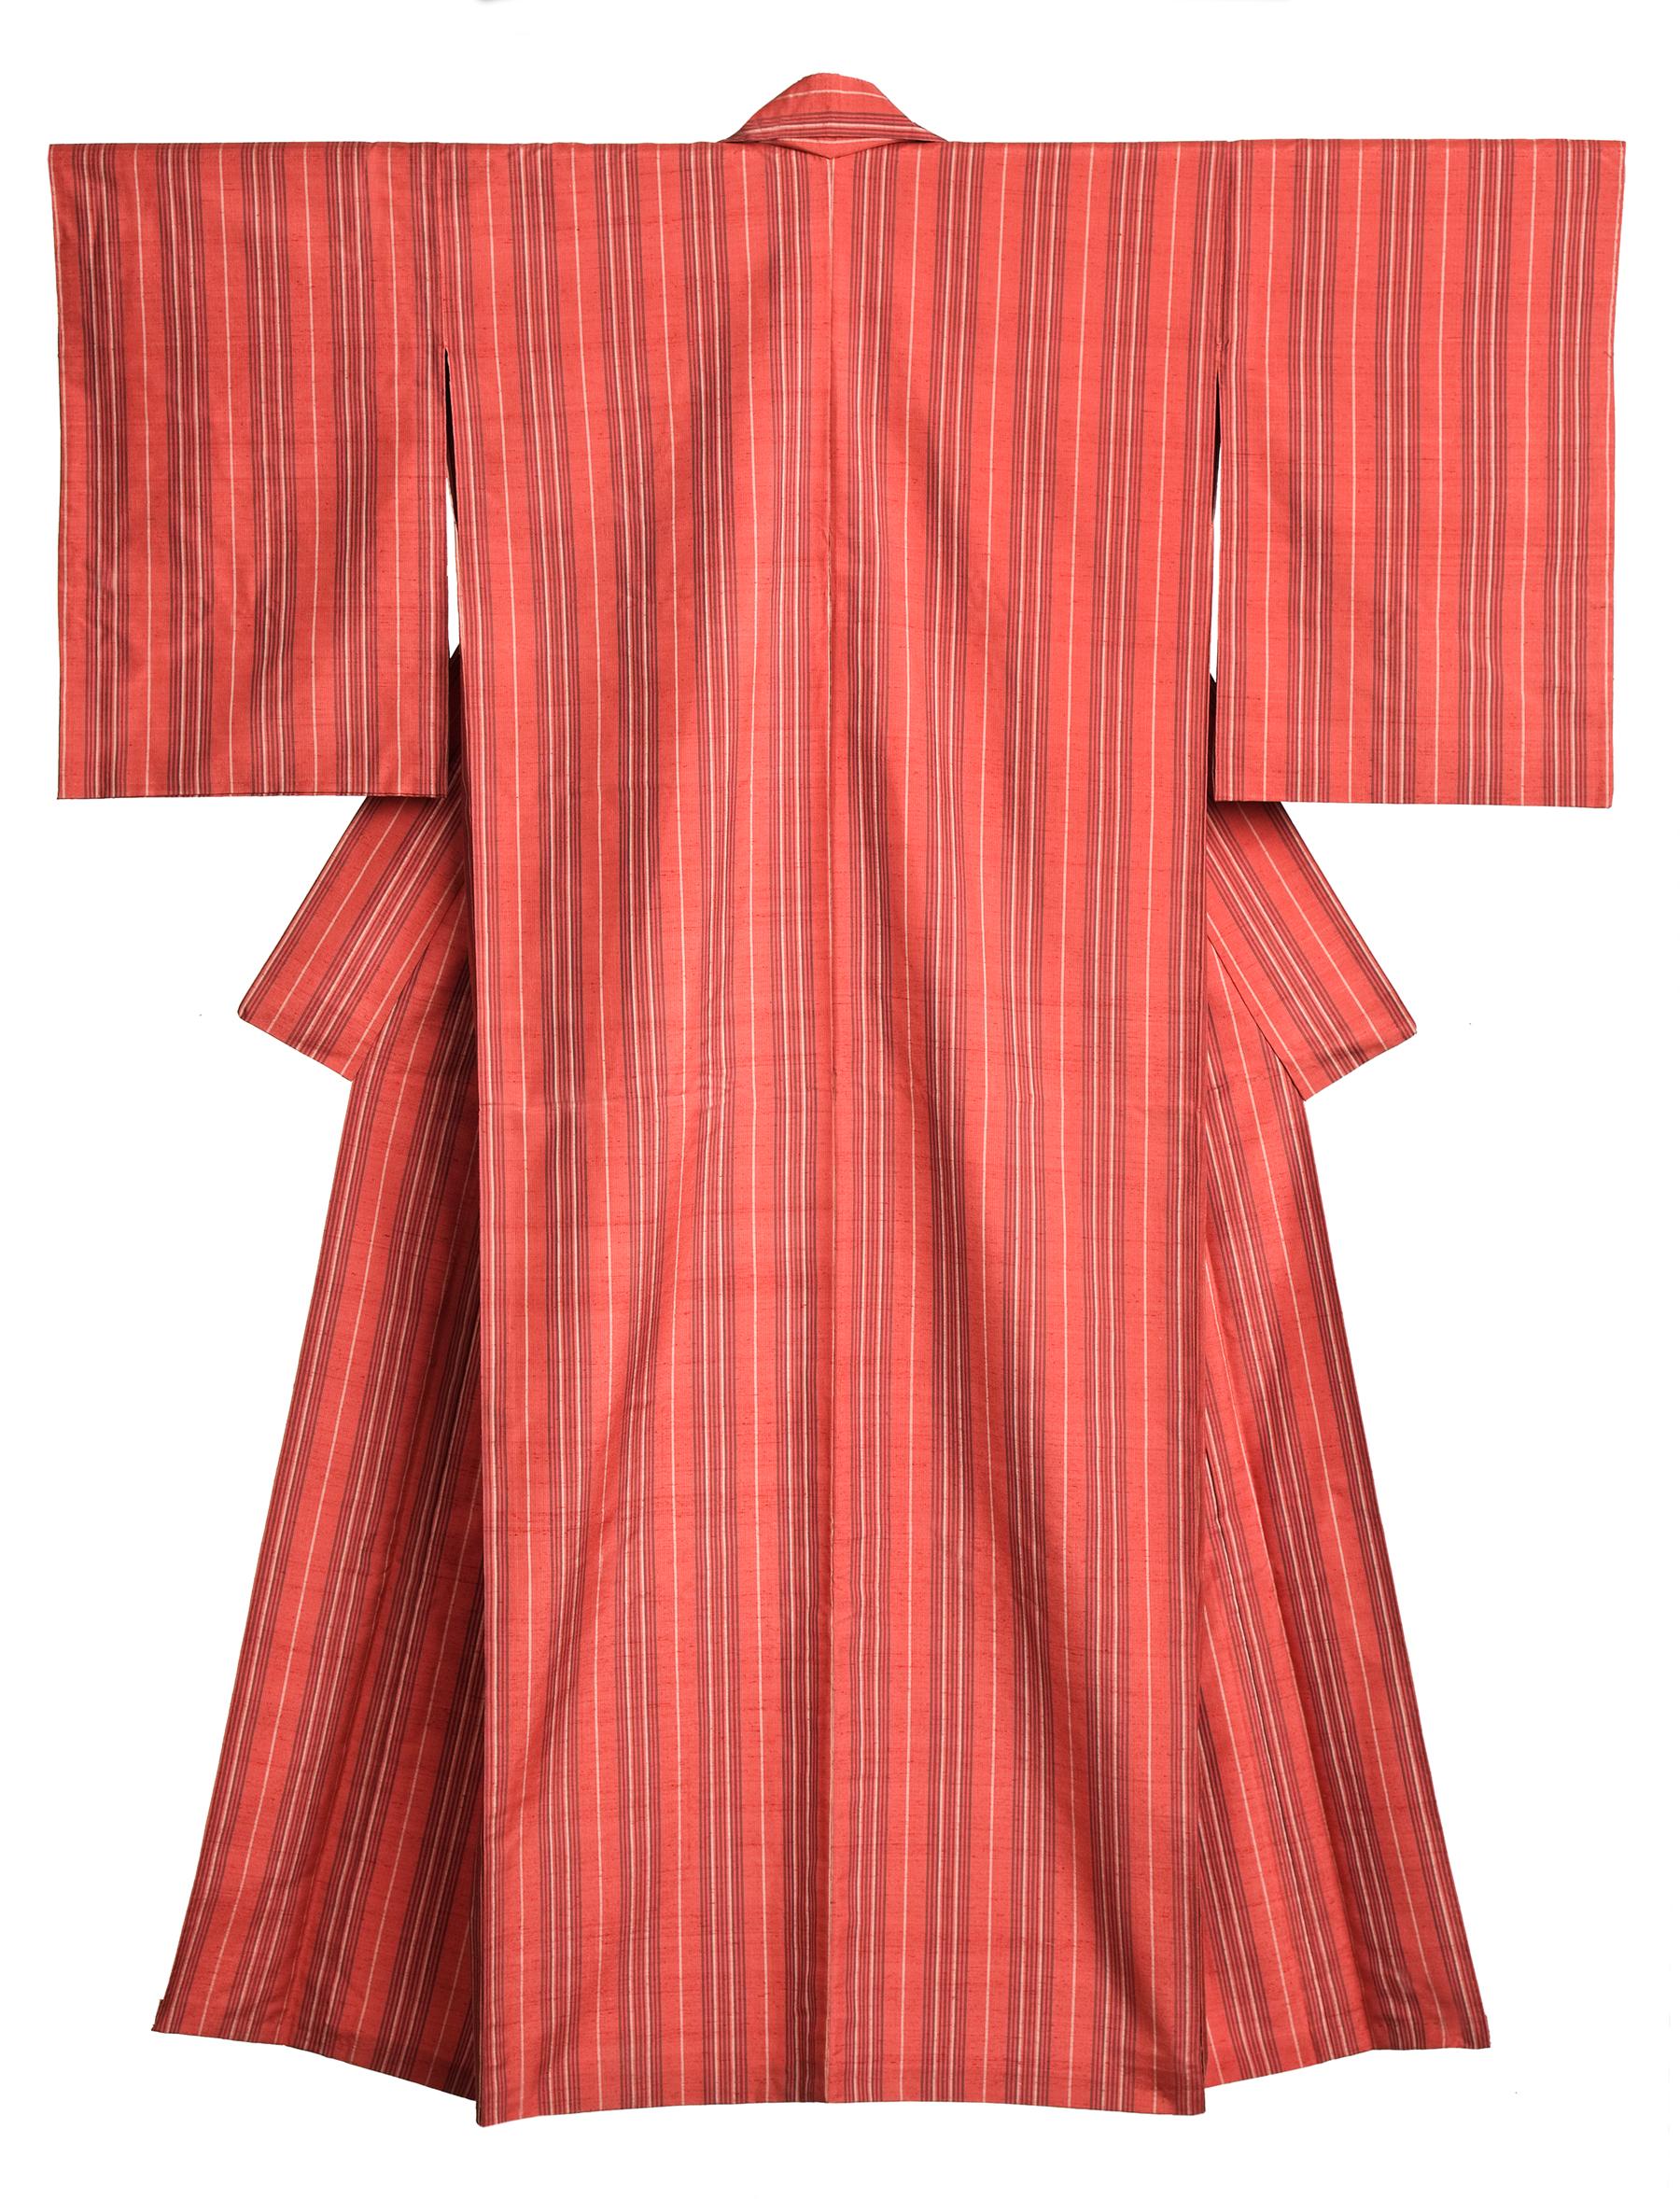 07_kimono.stripe01